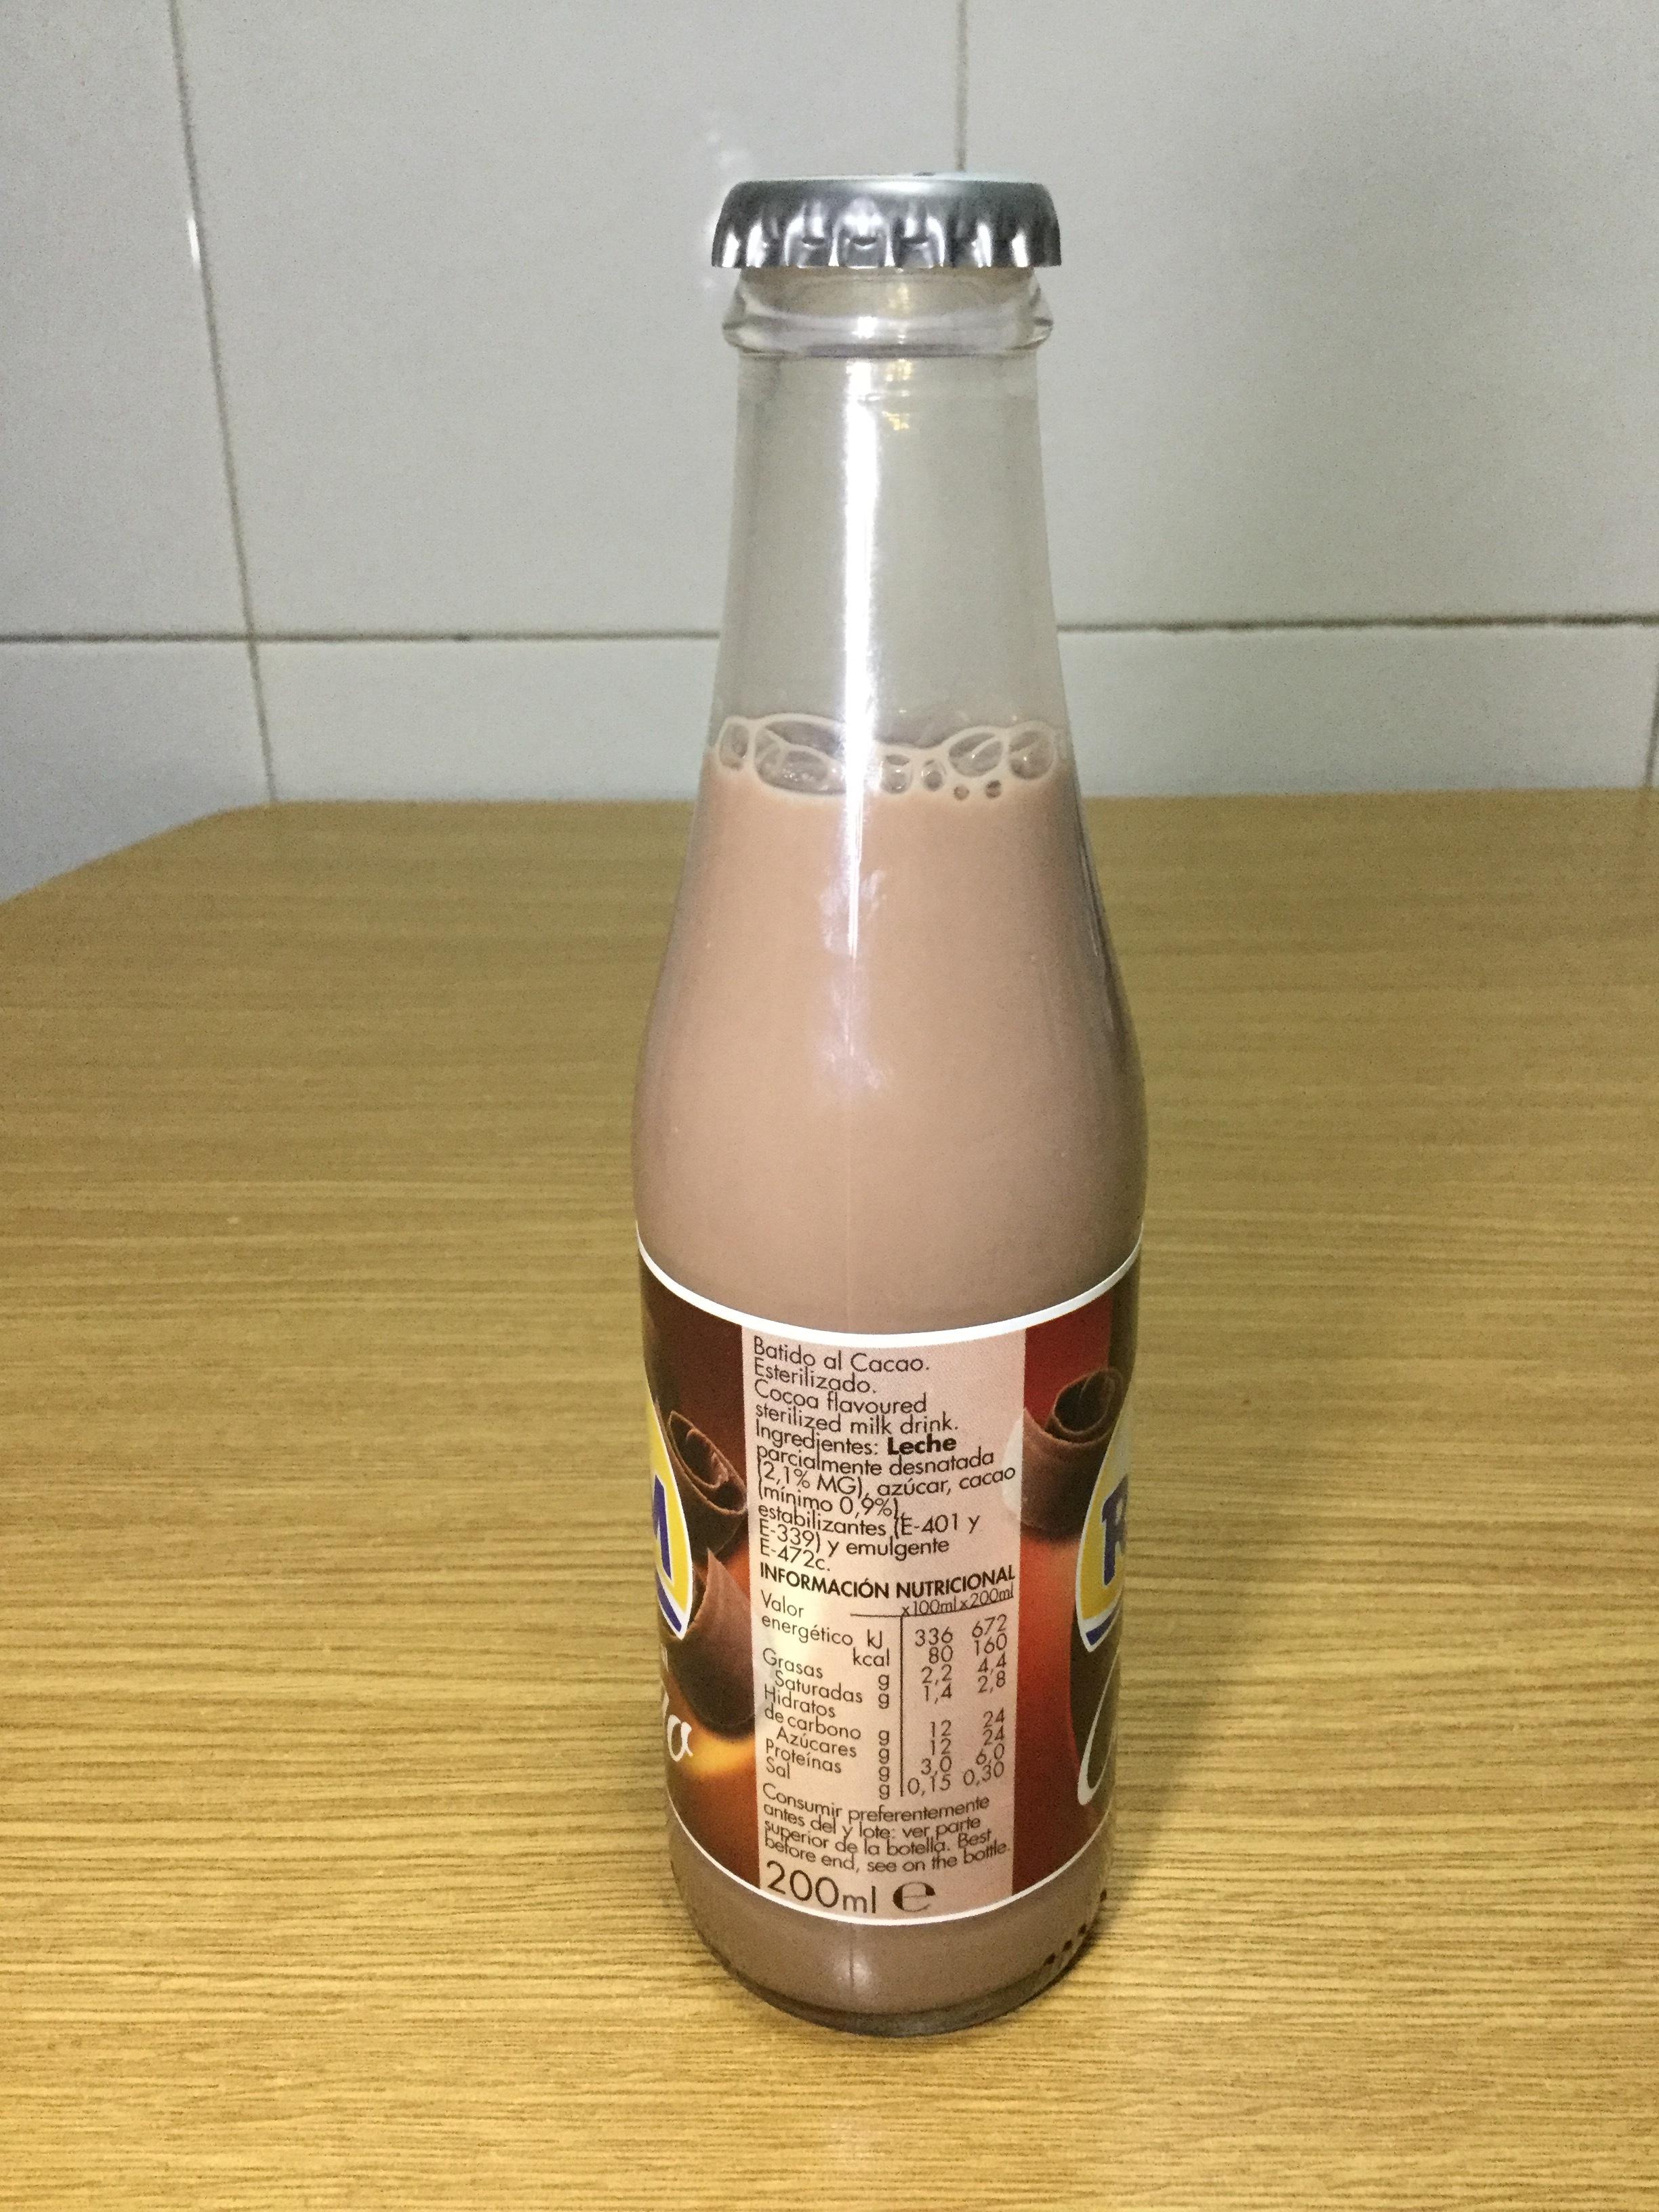 Ram Batido Al Cacao Side 1